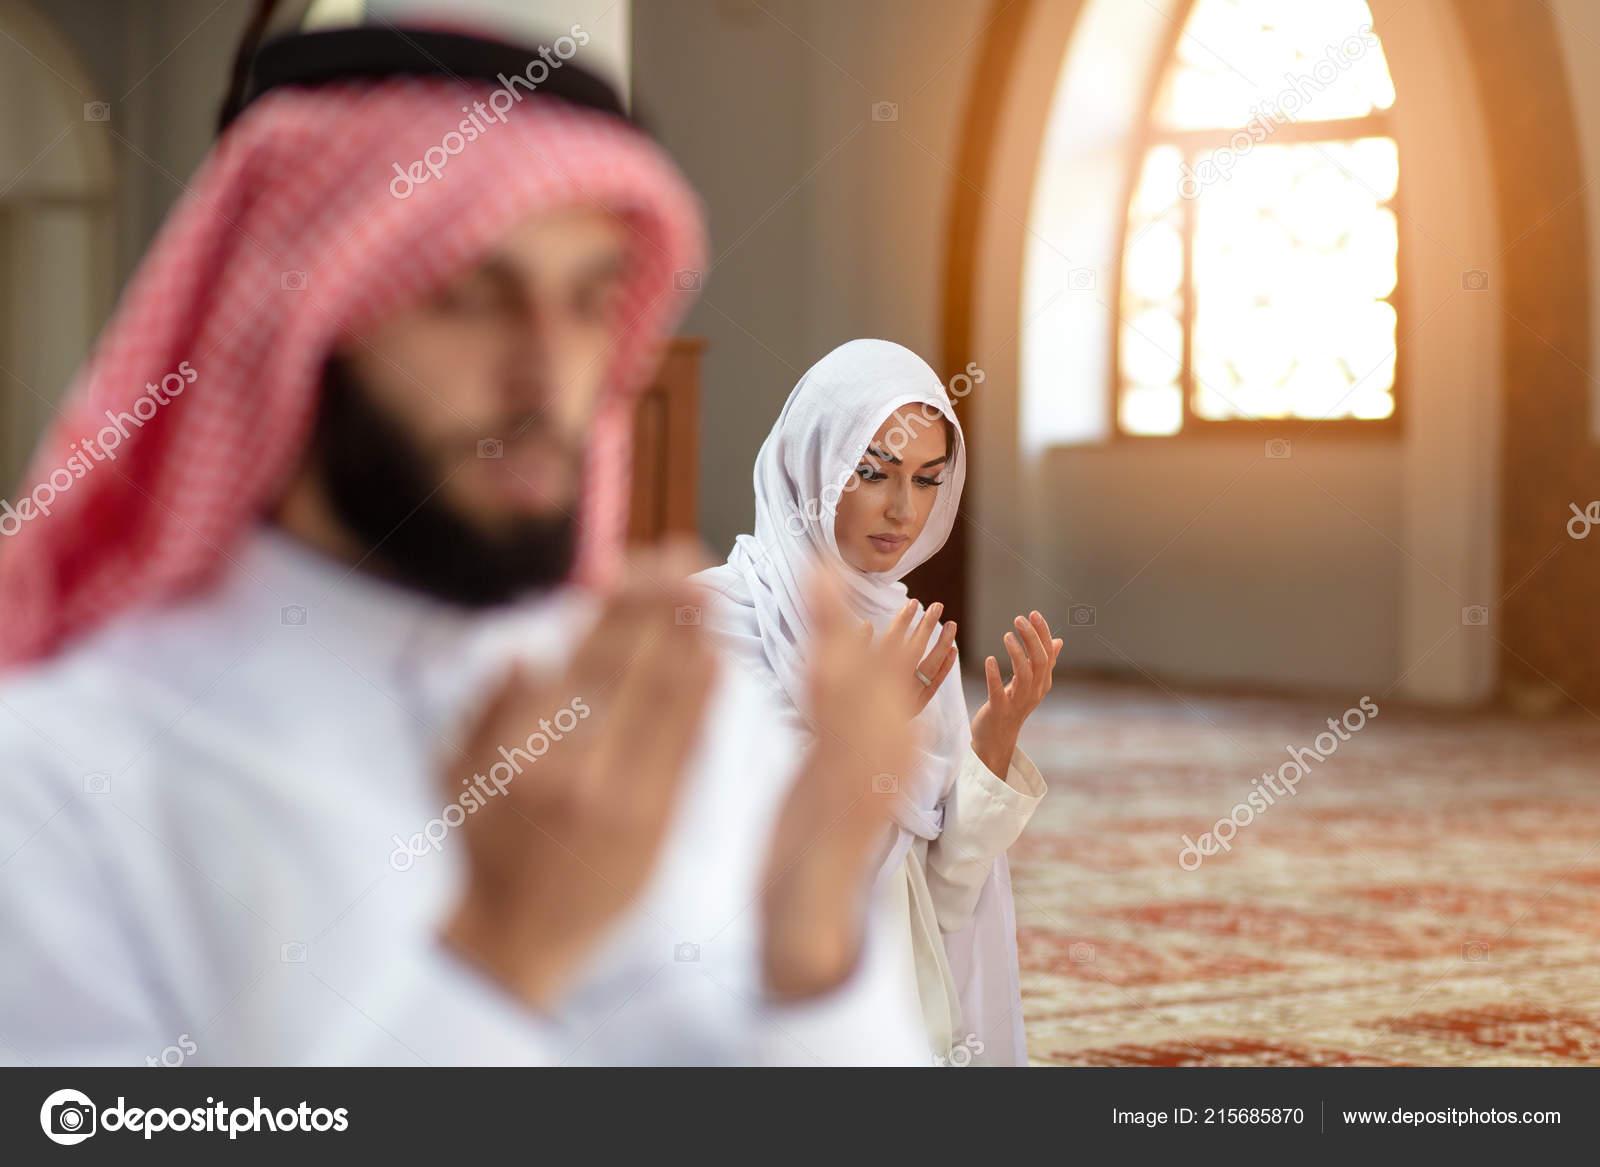 1e92deb10c7a Μουσουλμάνος προσεύχεται άνδρας και γυναίκα στο Τζαμί — Φωτογραφία Αρχείου